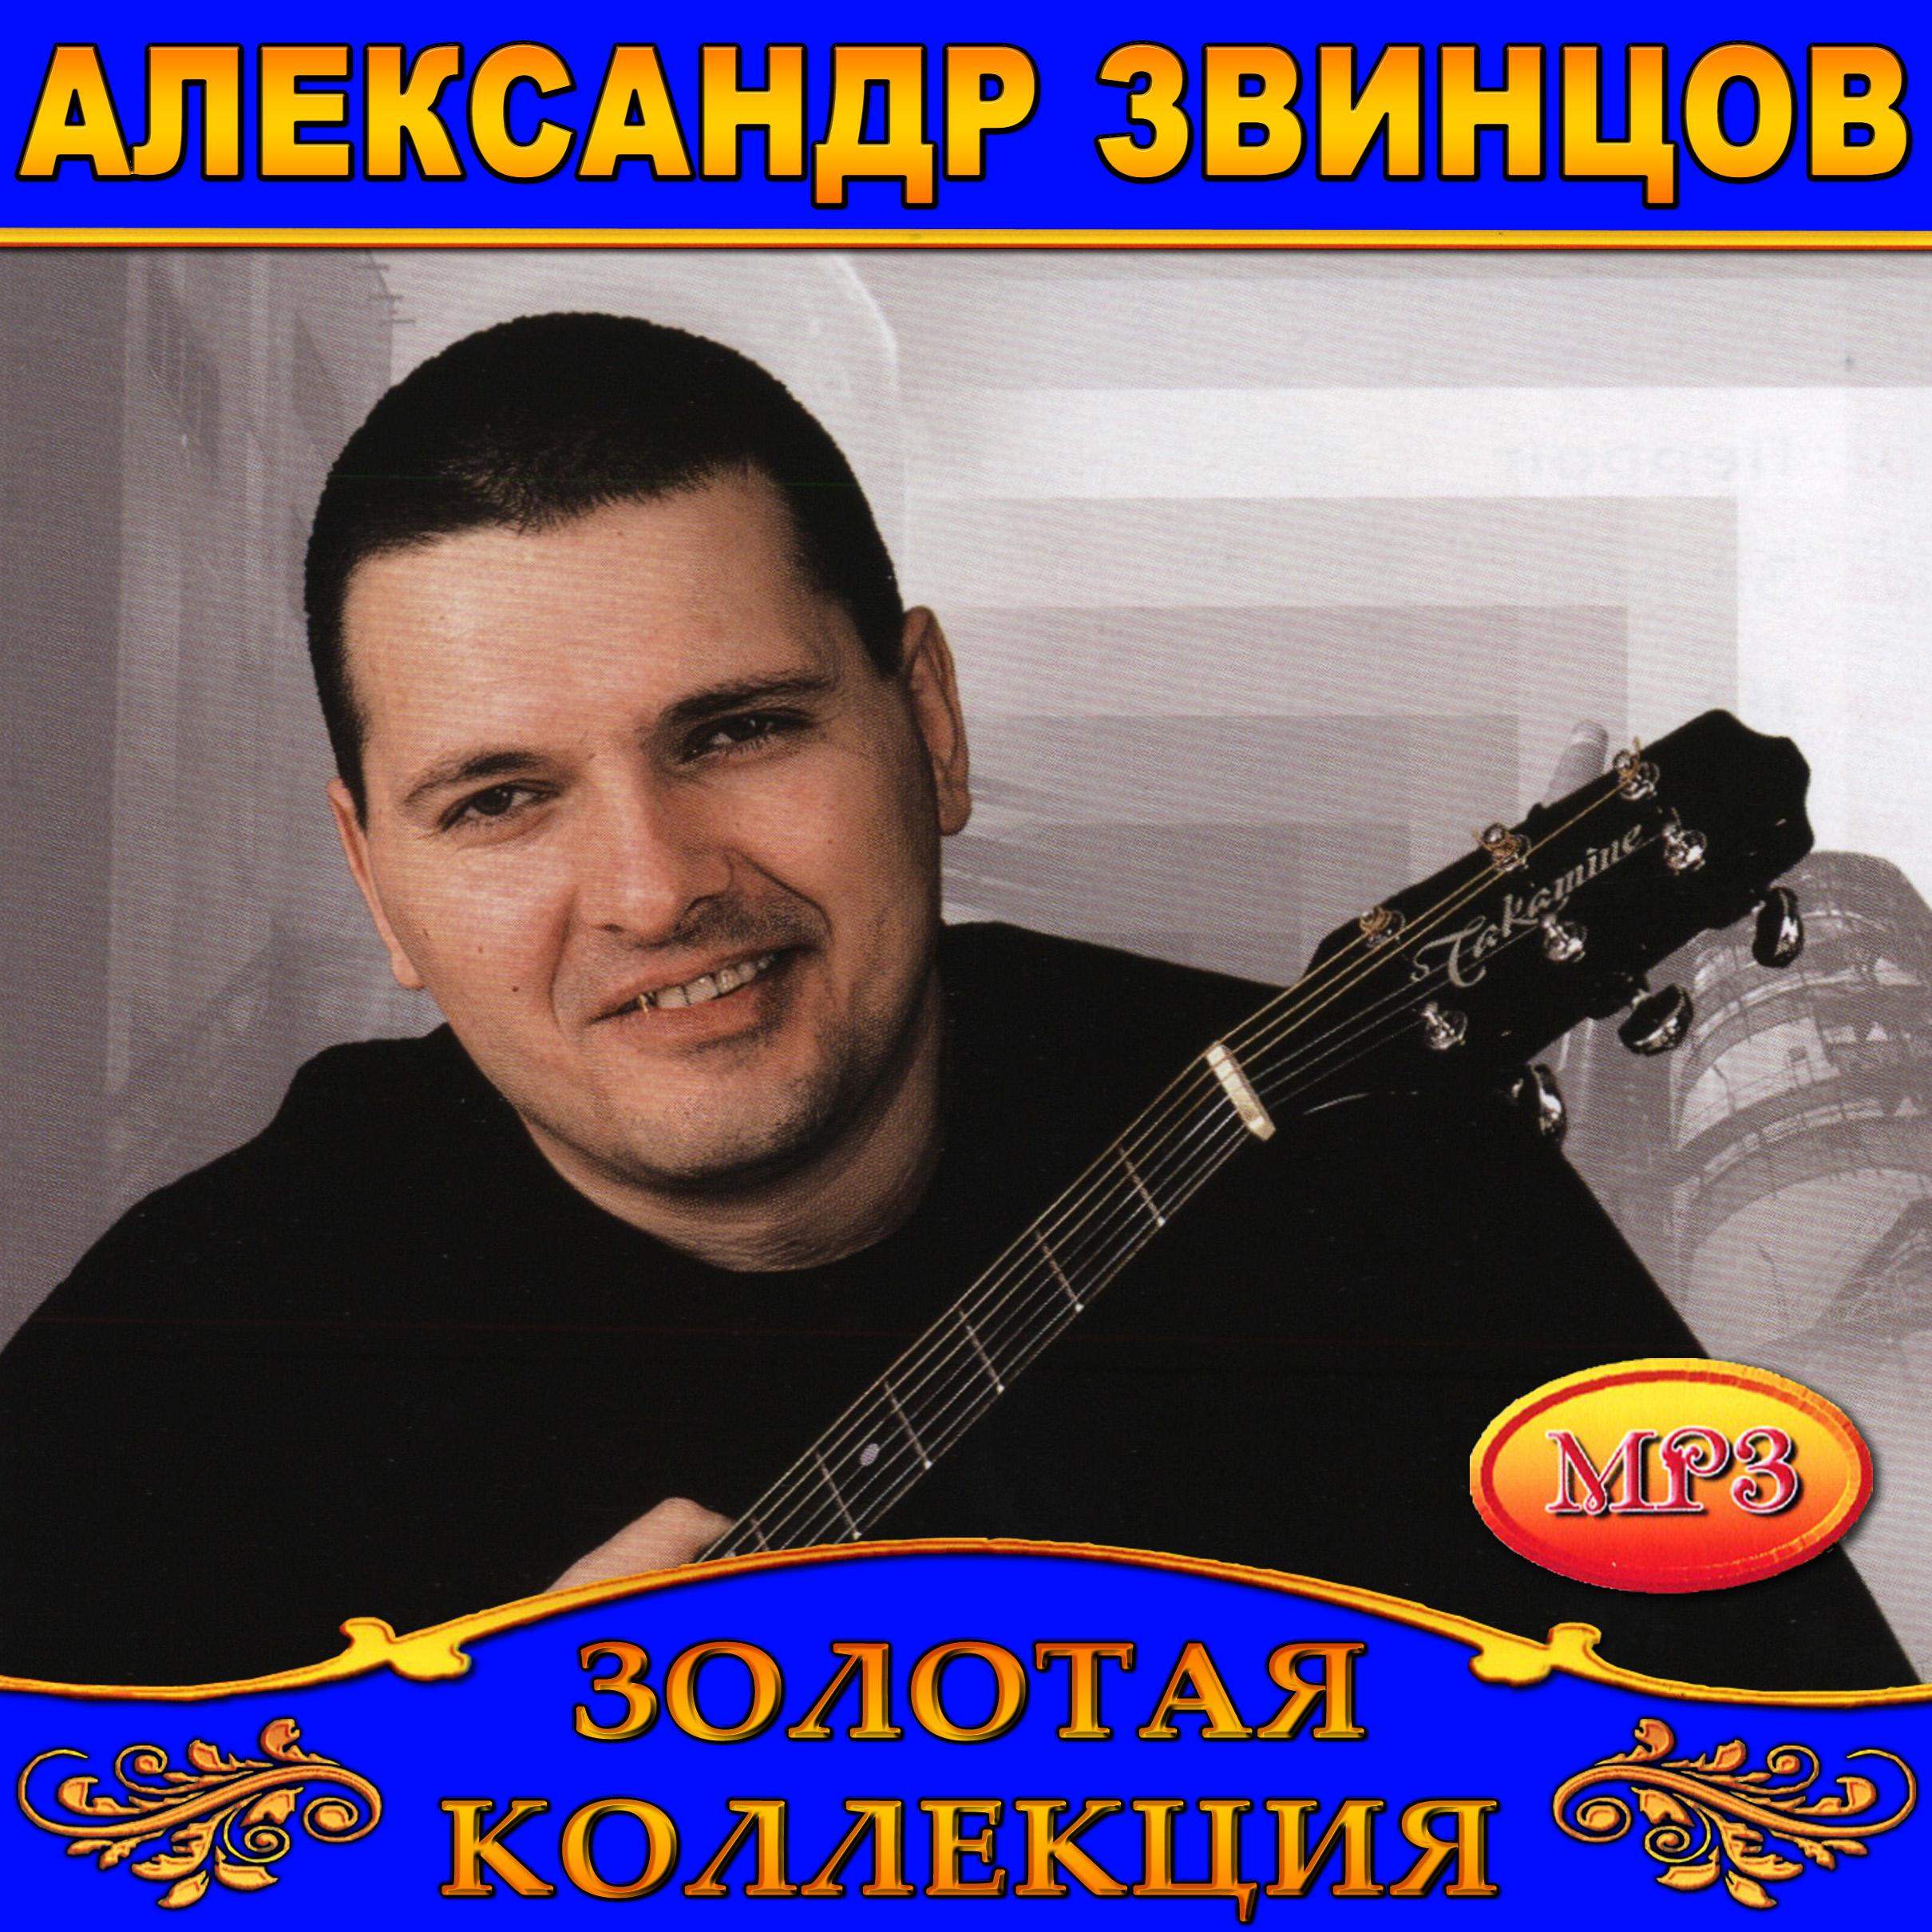 Александр Звинцов [mp3]